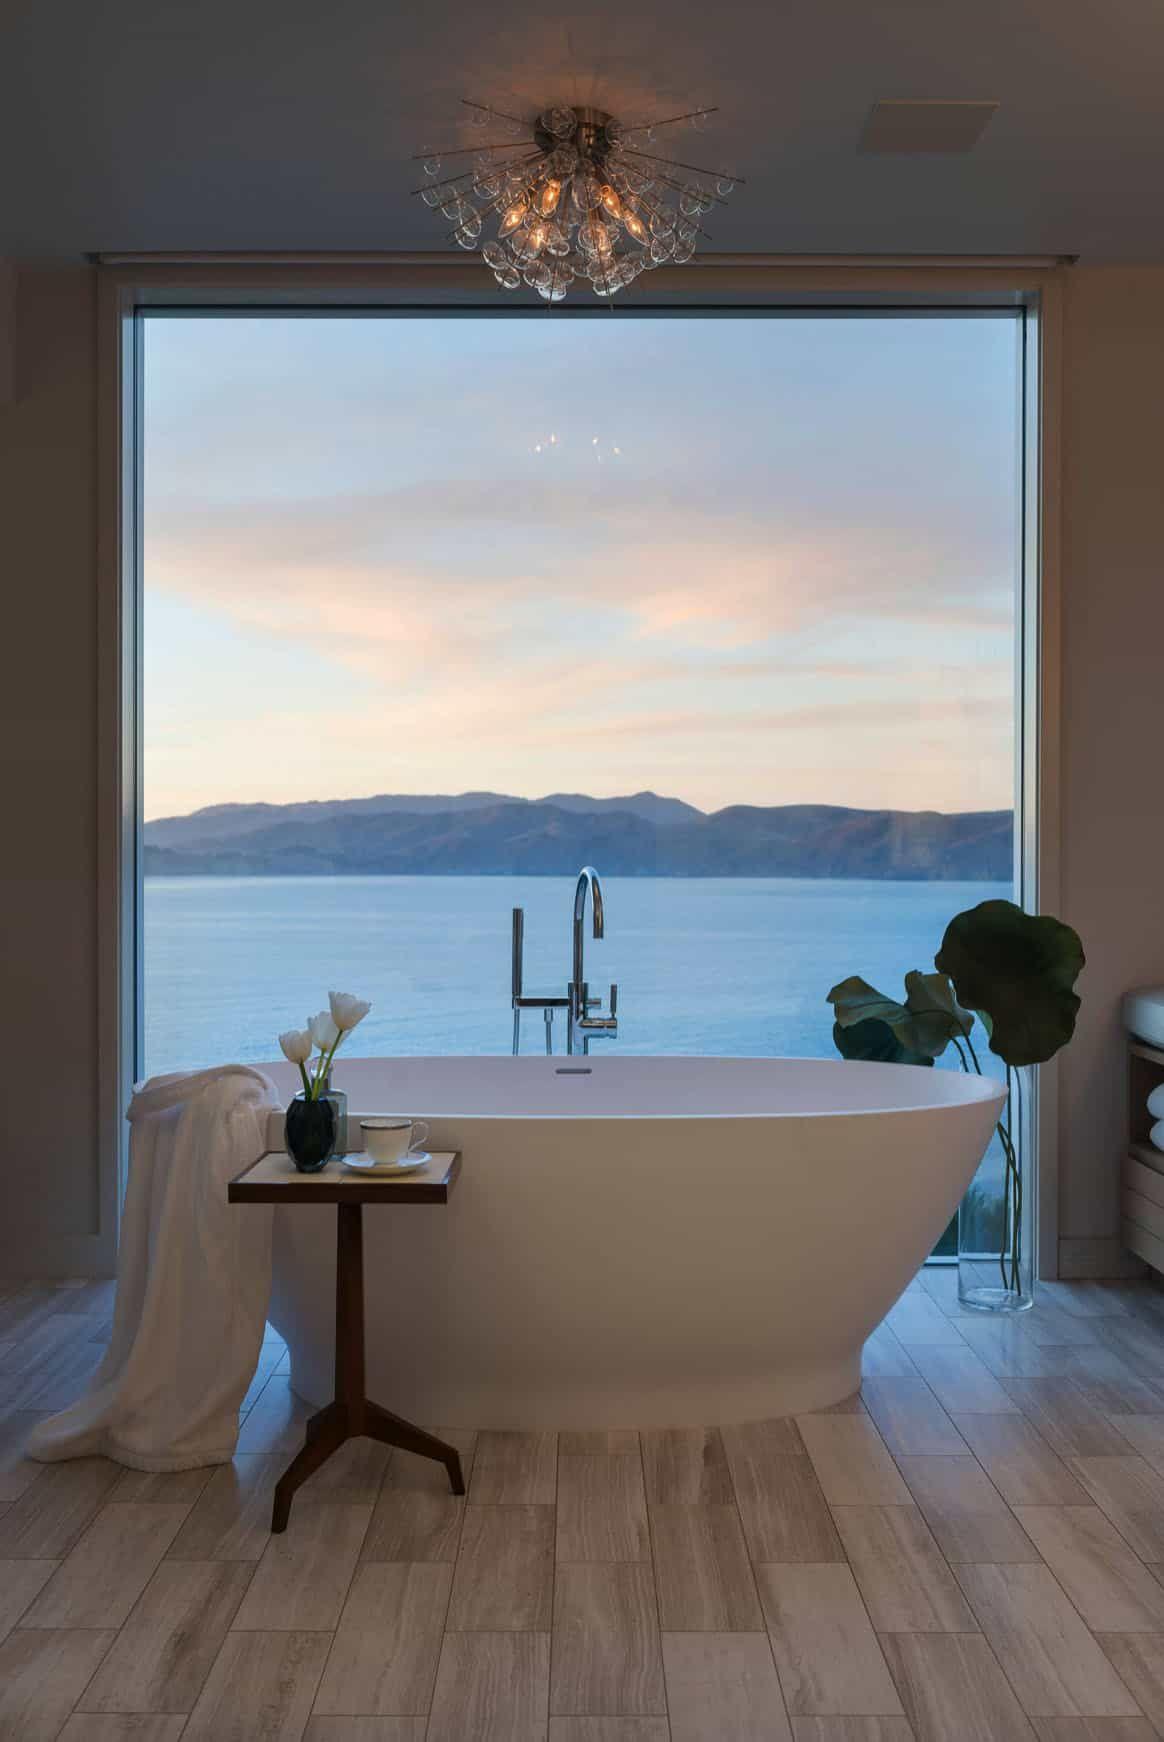 Mediterranean revival home feels like a beach getaway in San Francisco